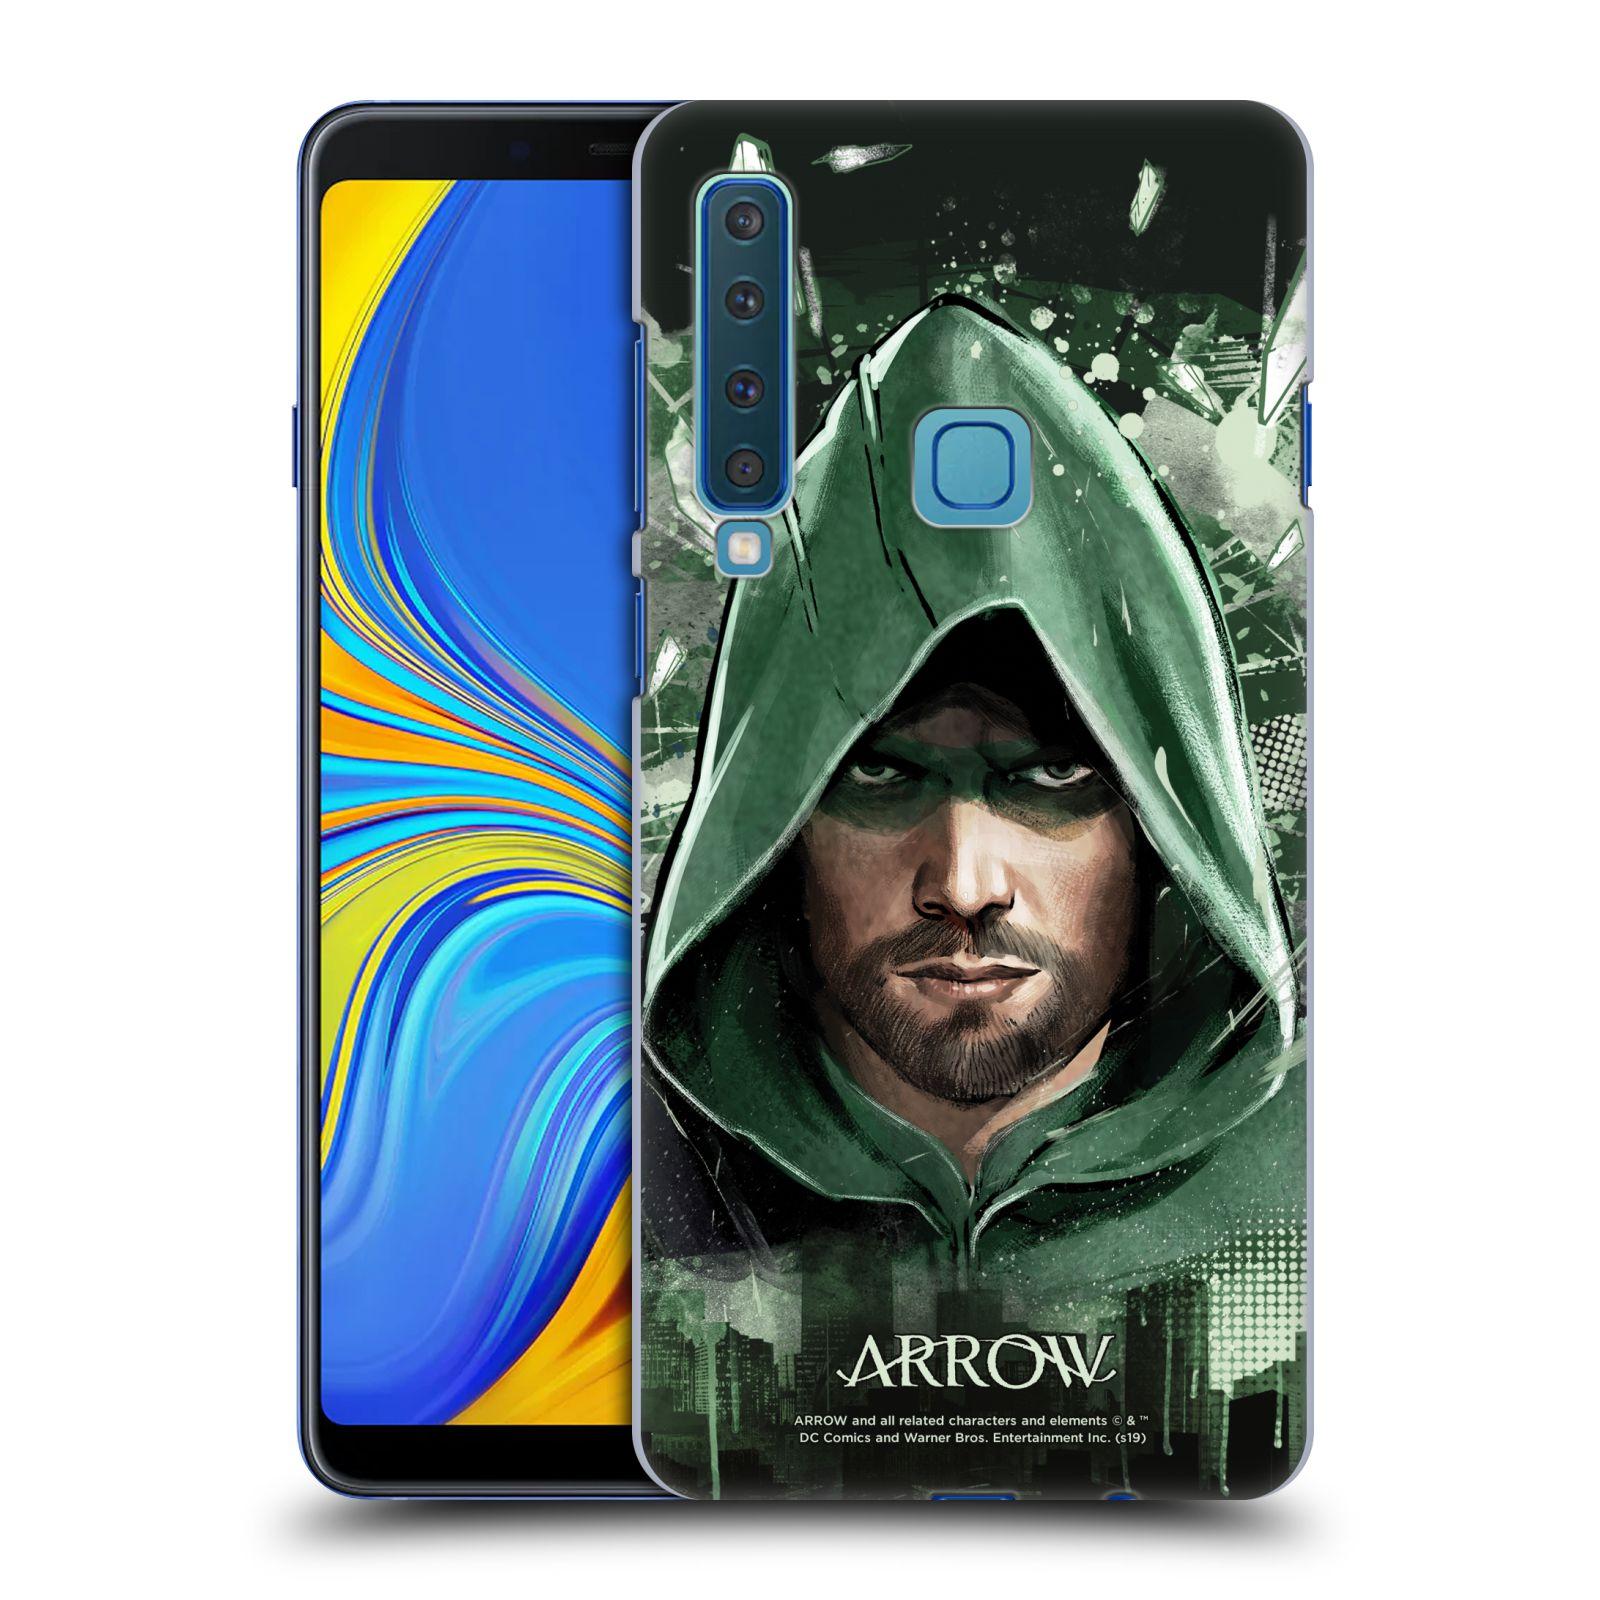 Pouzdro na mobil Samsung Galaxy A9 2018 - HEAD CASE - Seriál Arrow - kreslený motiv